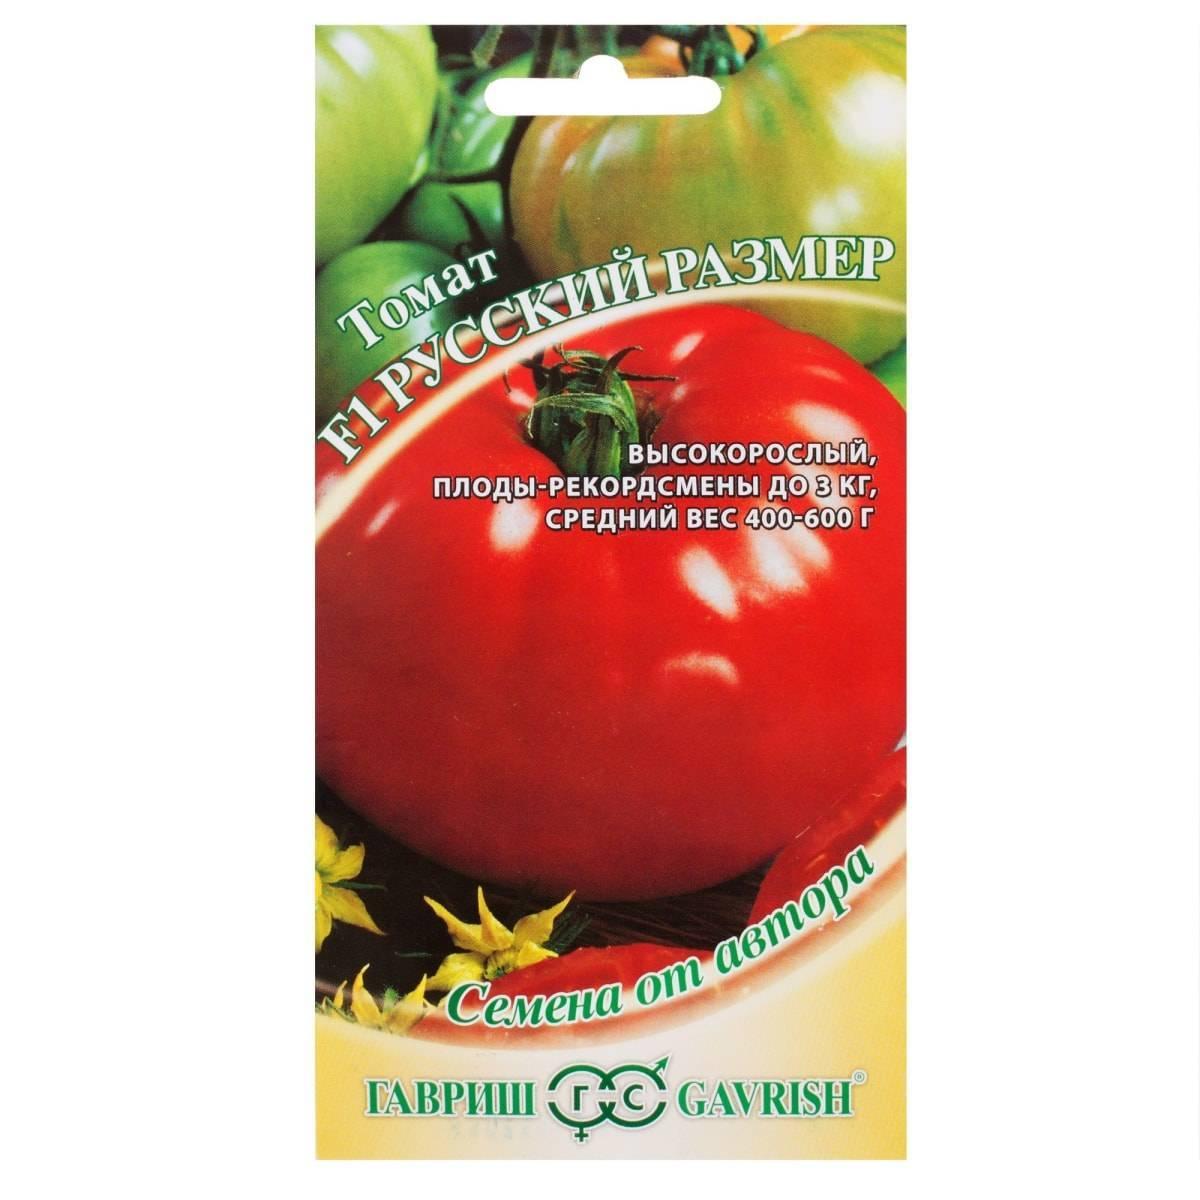 Описание и характеристика сорта томата русский размер